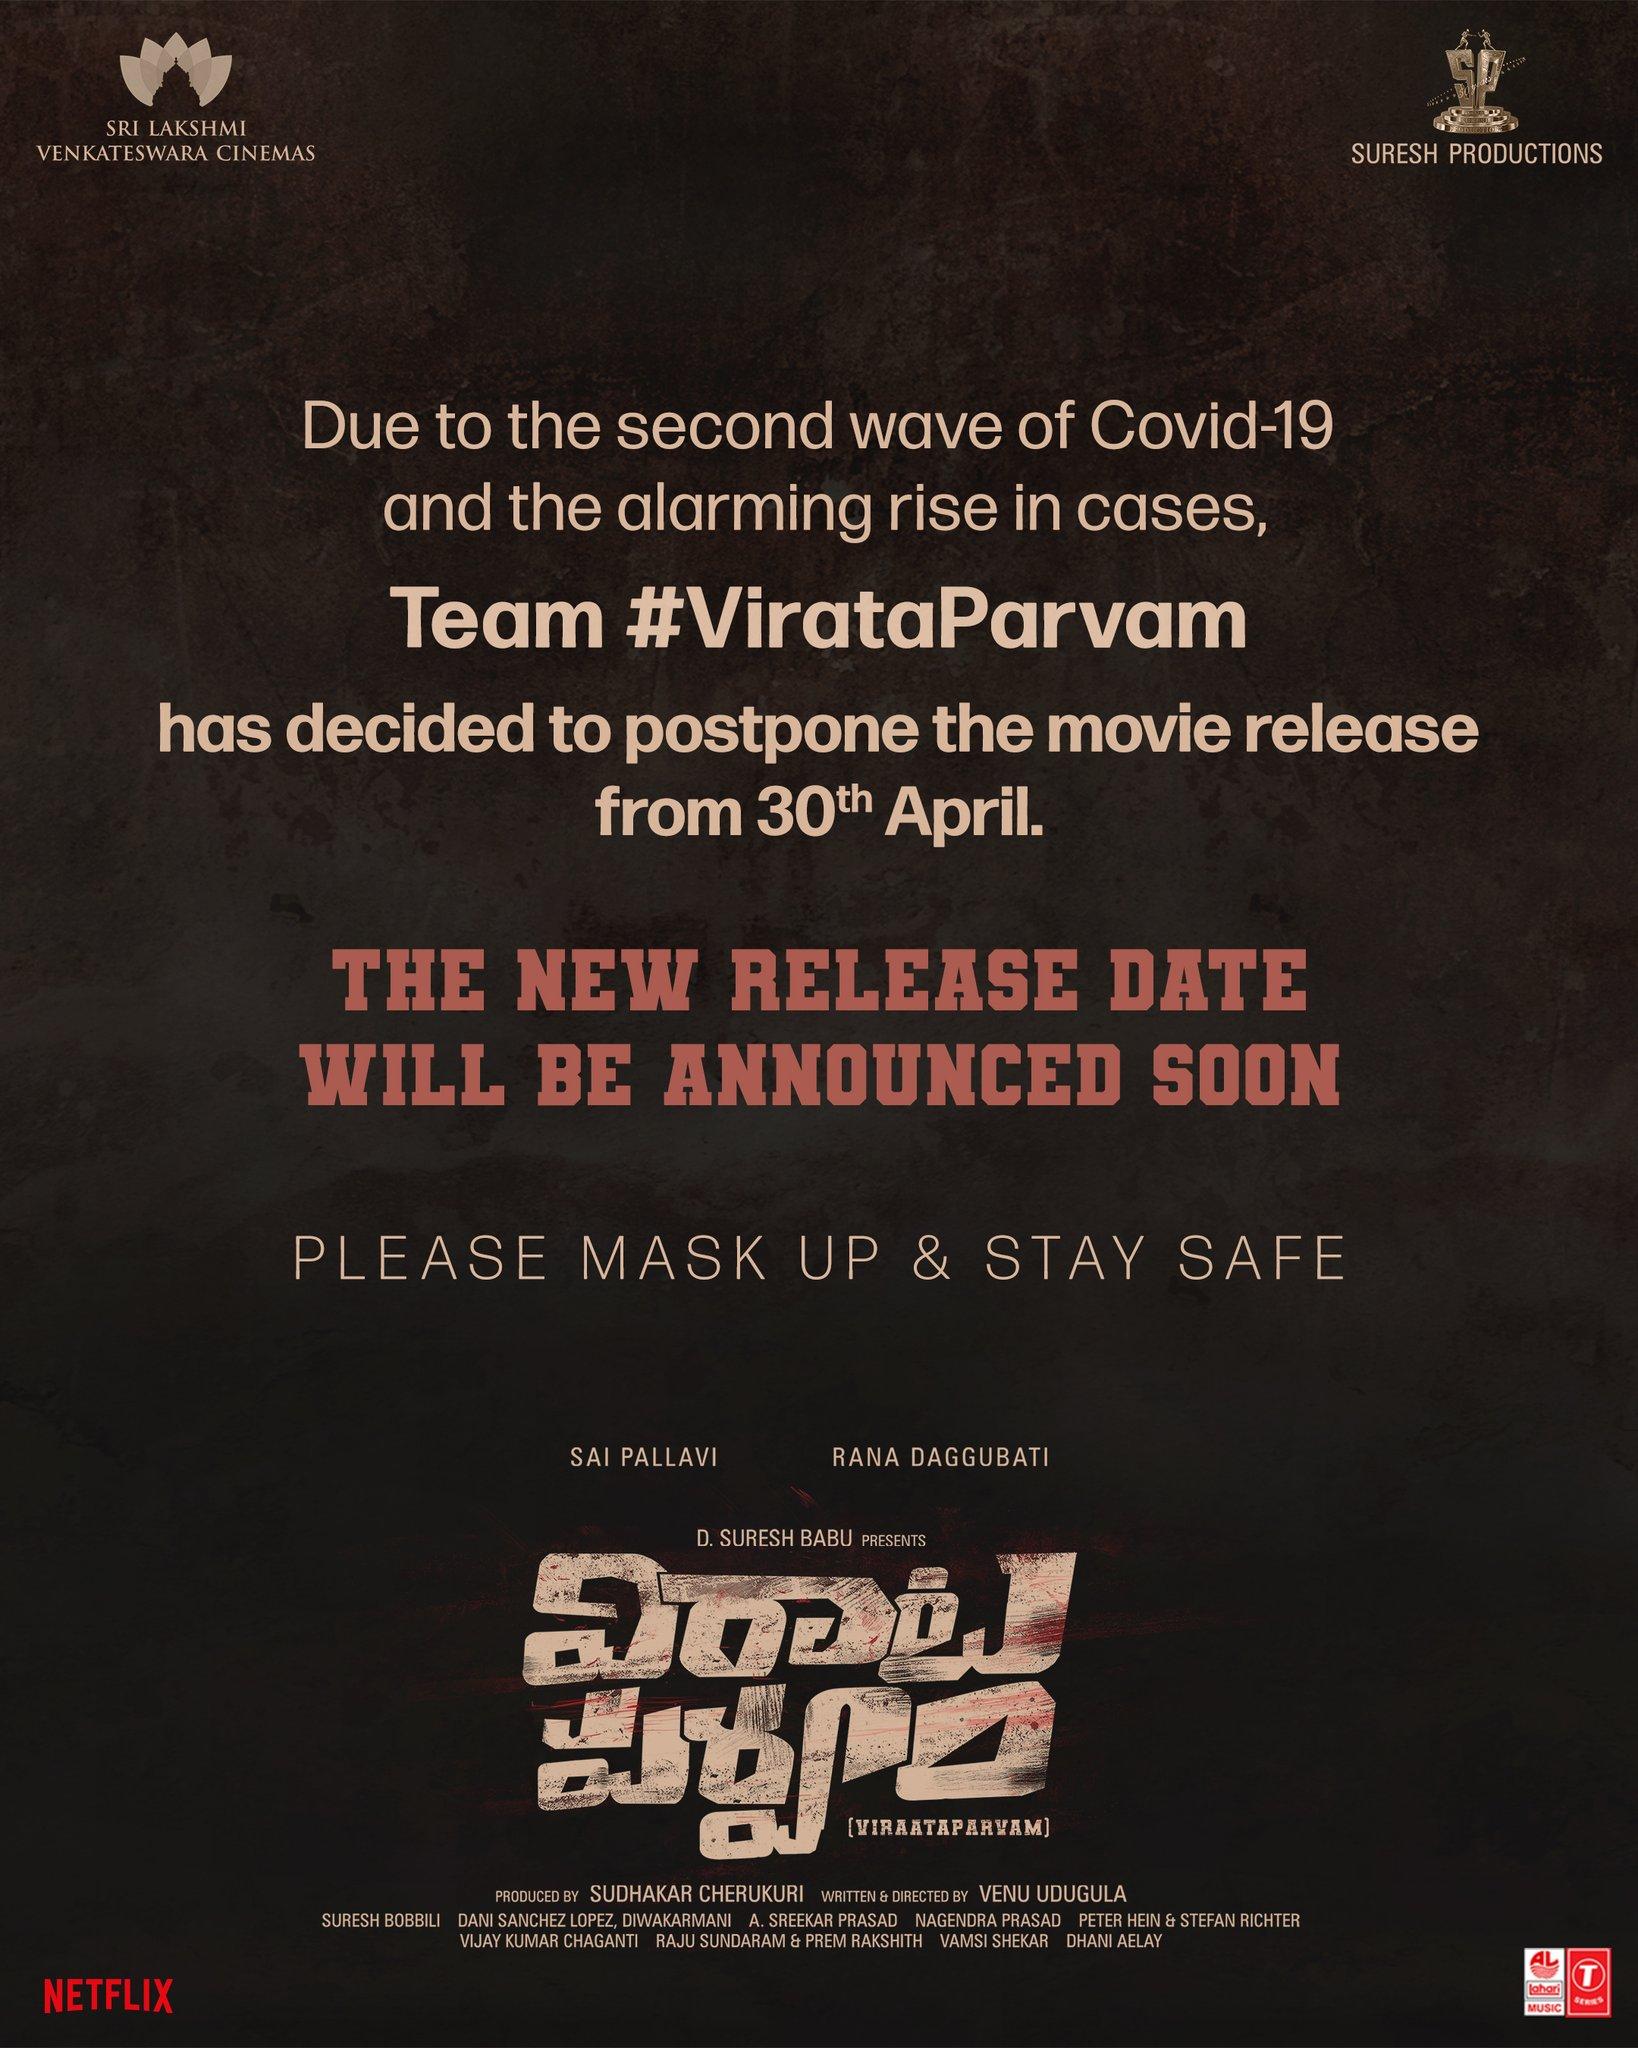 Rana, Sai Pallavi, Venu Udugula's Virata Parvam Release Gets Postponed